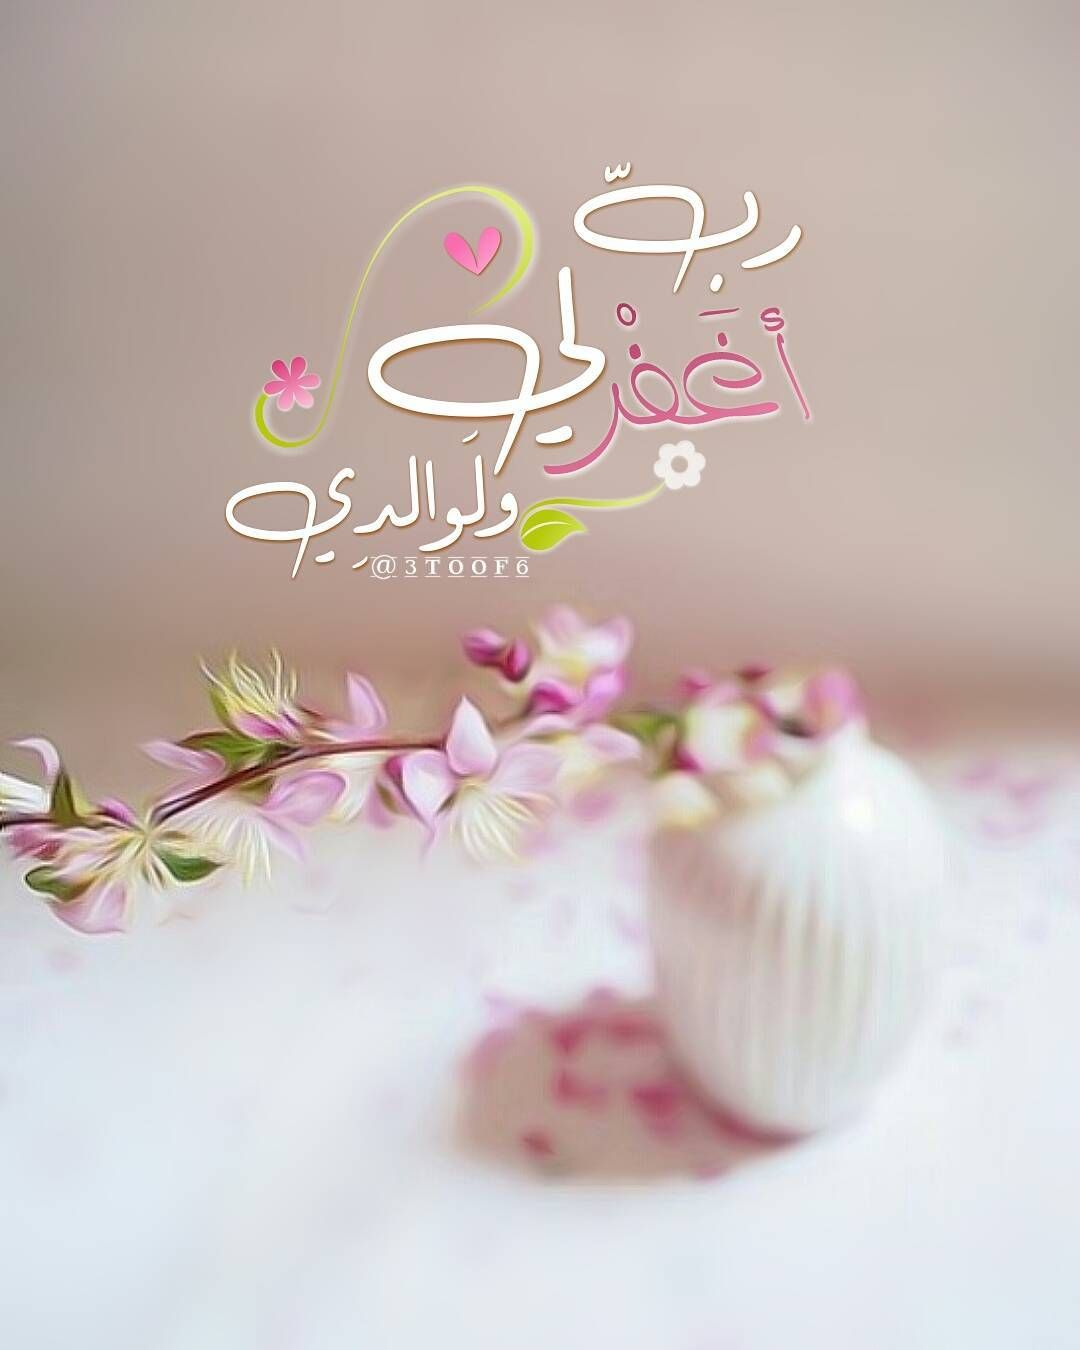 صروح المجد On Instagram رب اغفر لي ولوالدي Islamic Pictures